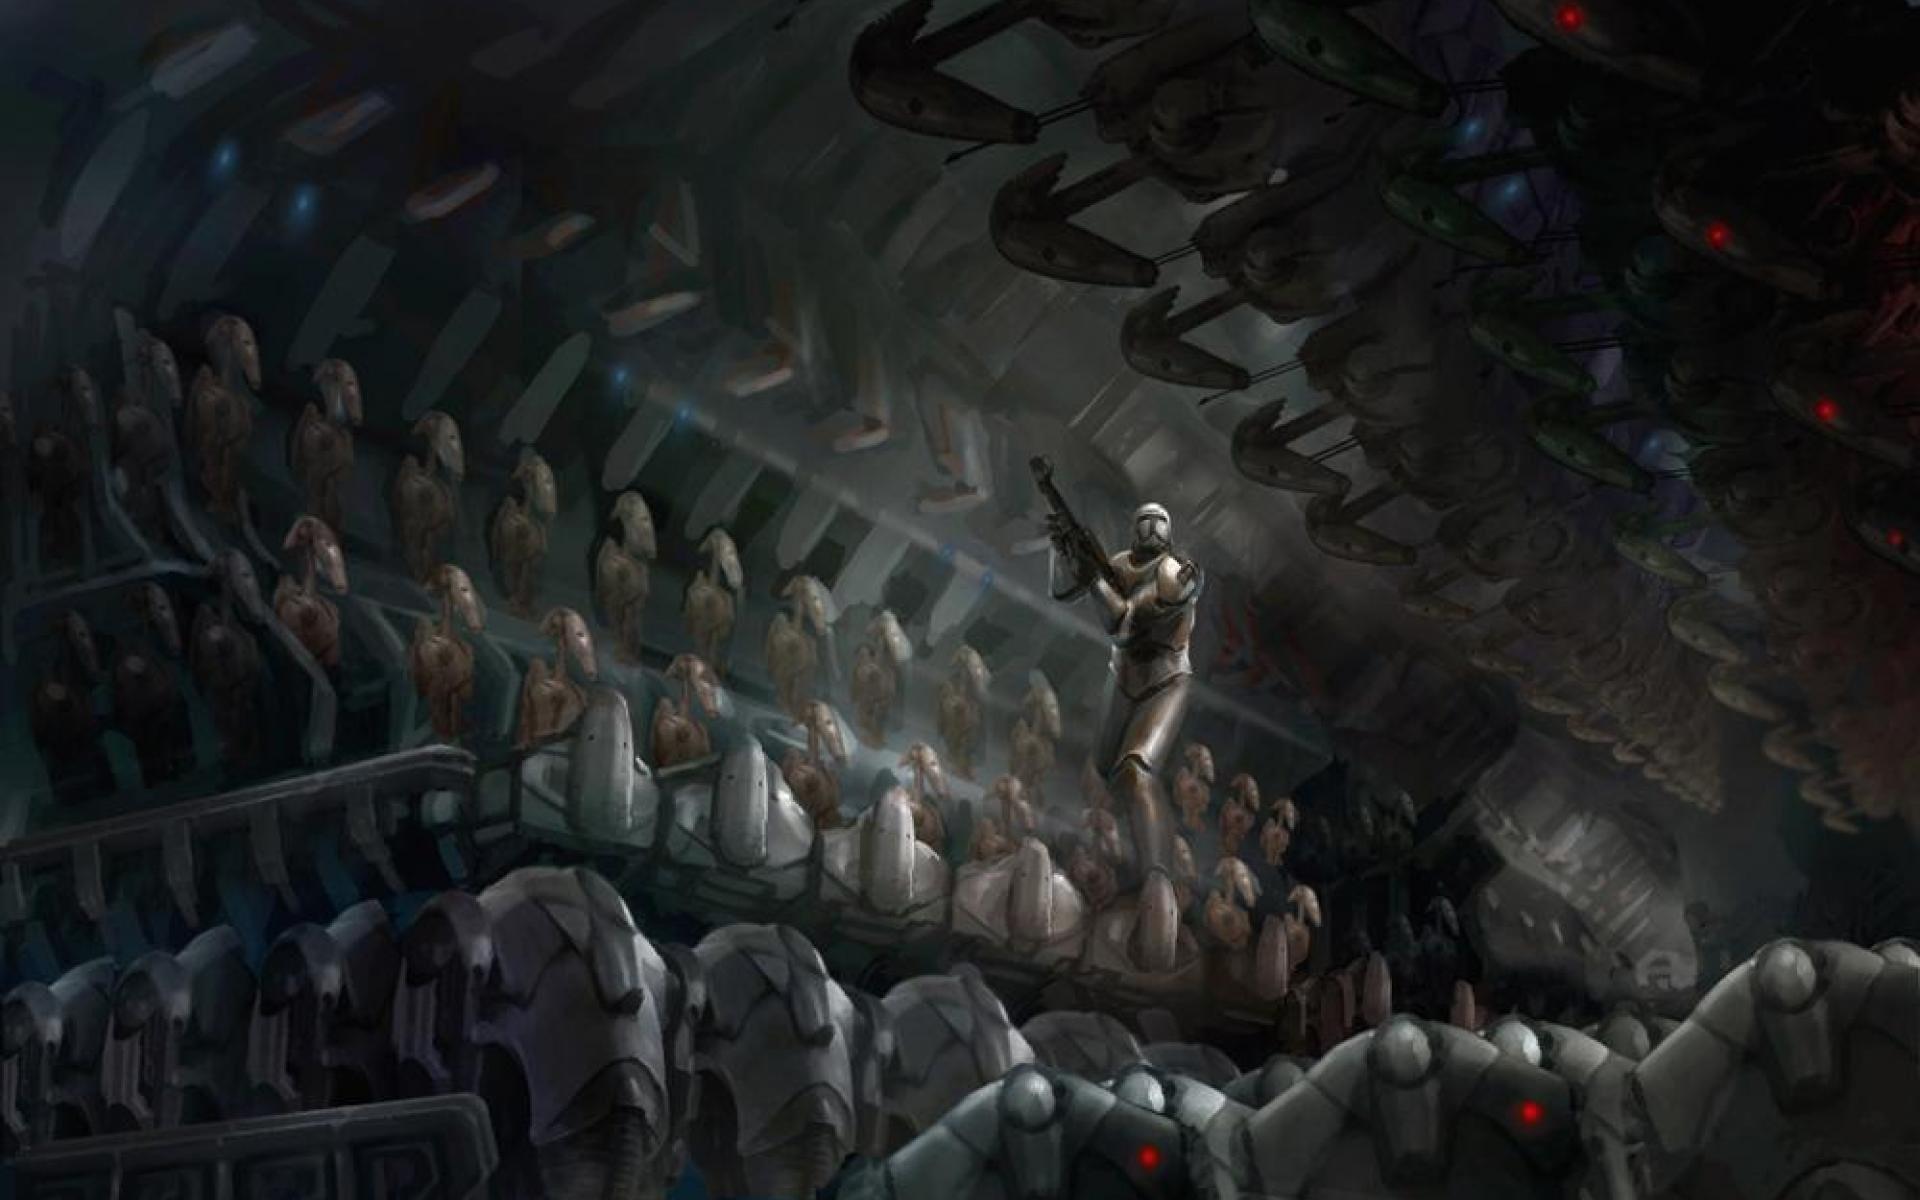 Star Wars Republic Commando Art Wallpaper